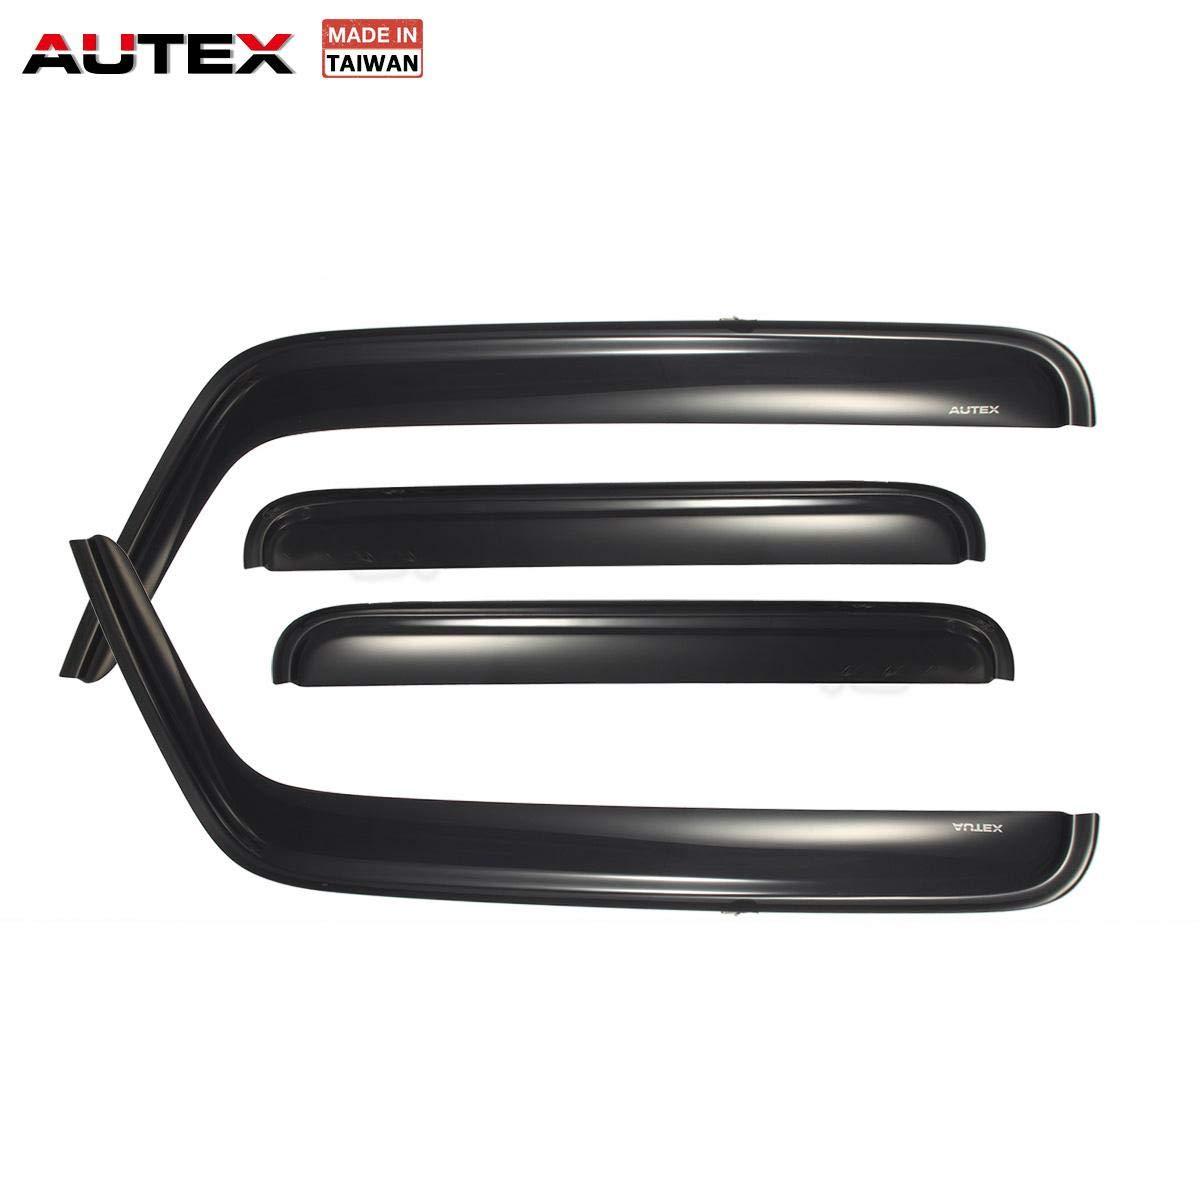 AUTEX Tape on Window Visor Compatible with H3 2005 2006 2007 2008 2009 Side Window Wind Deflector Sun Rain Guard